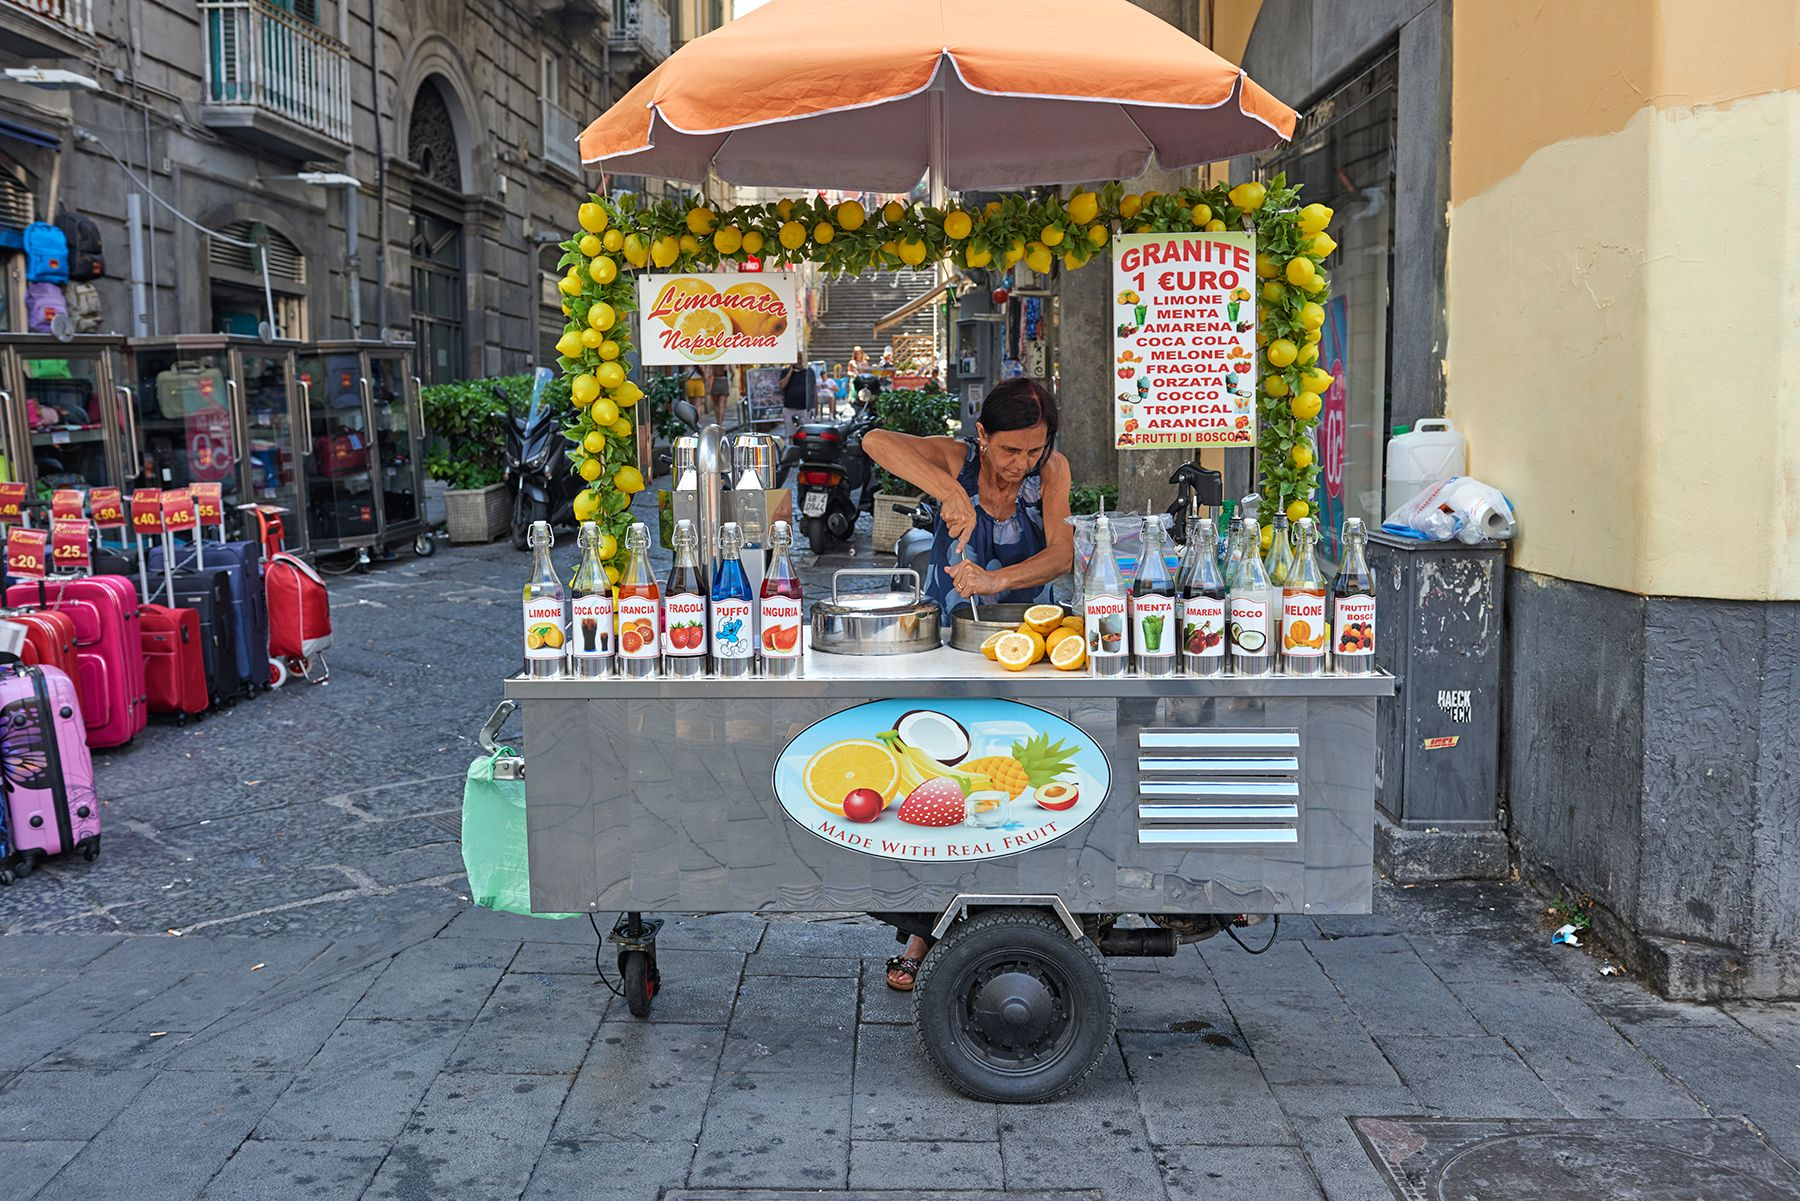 Limonata napoletana